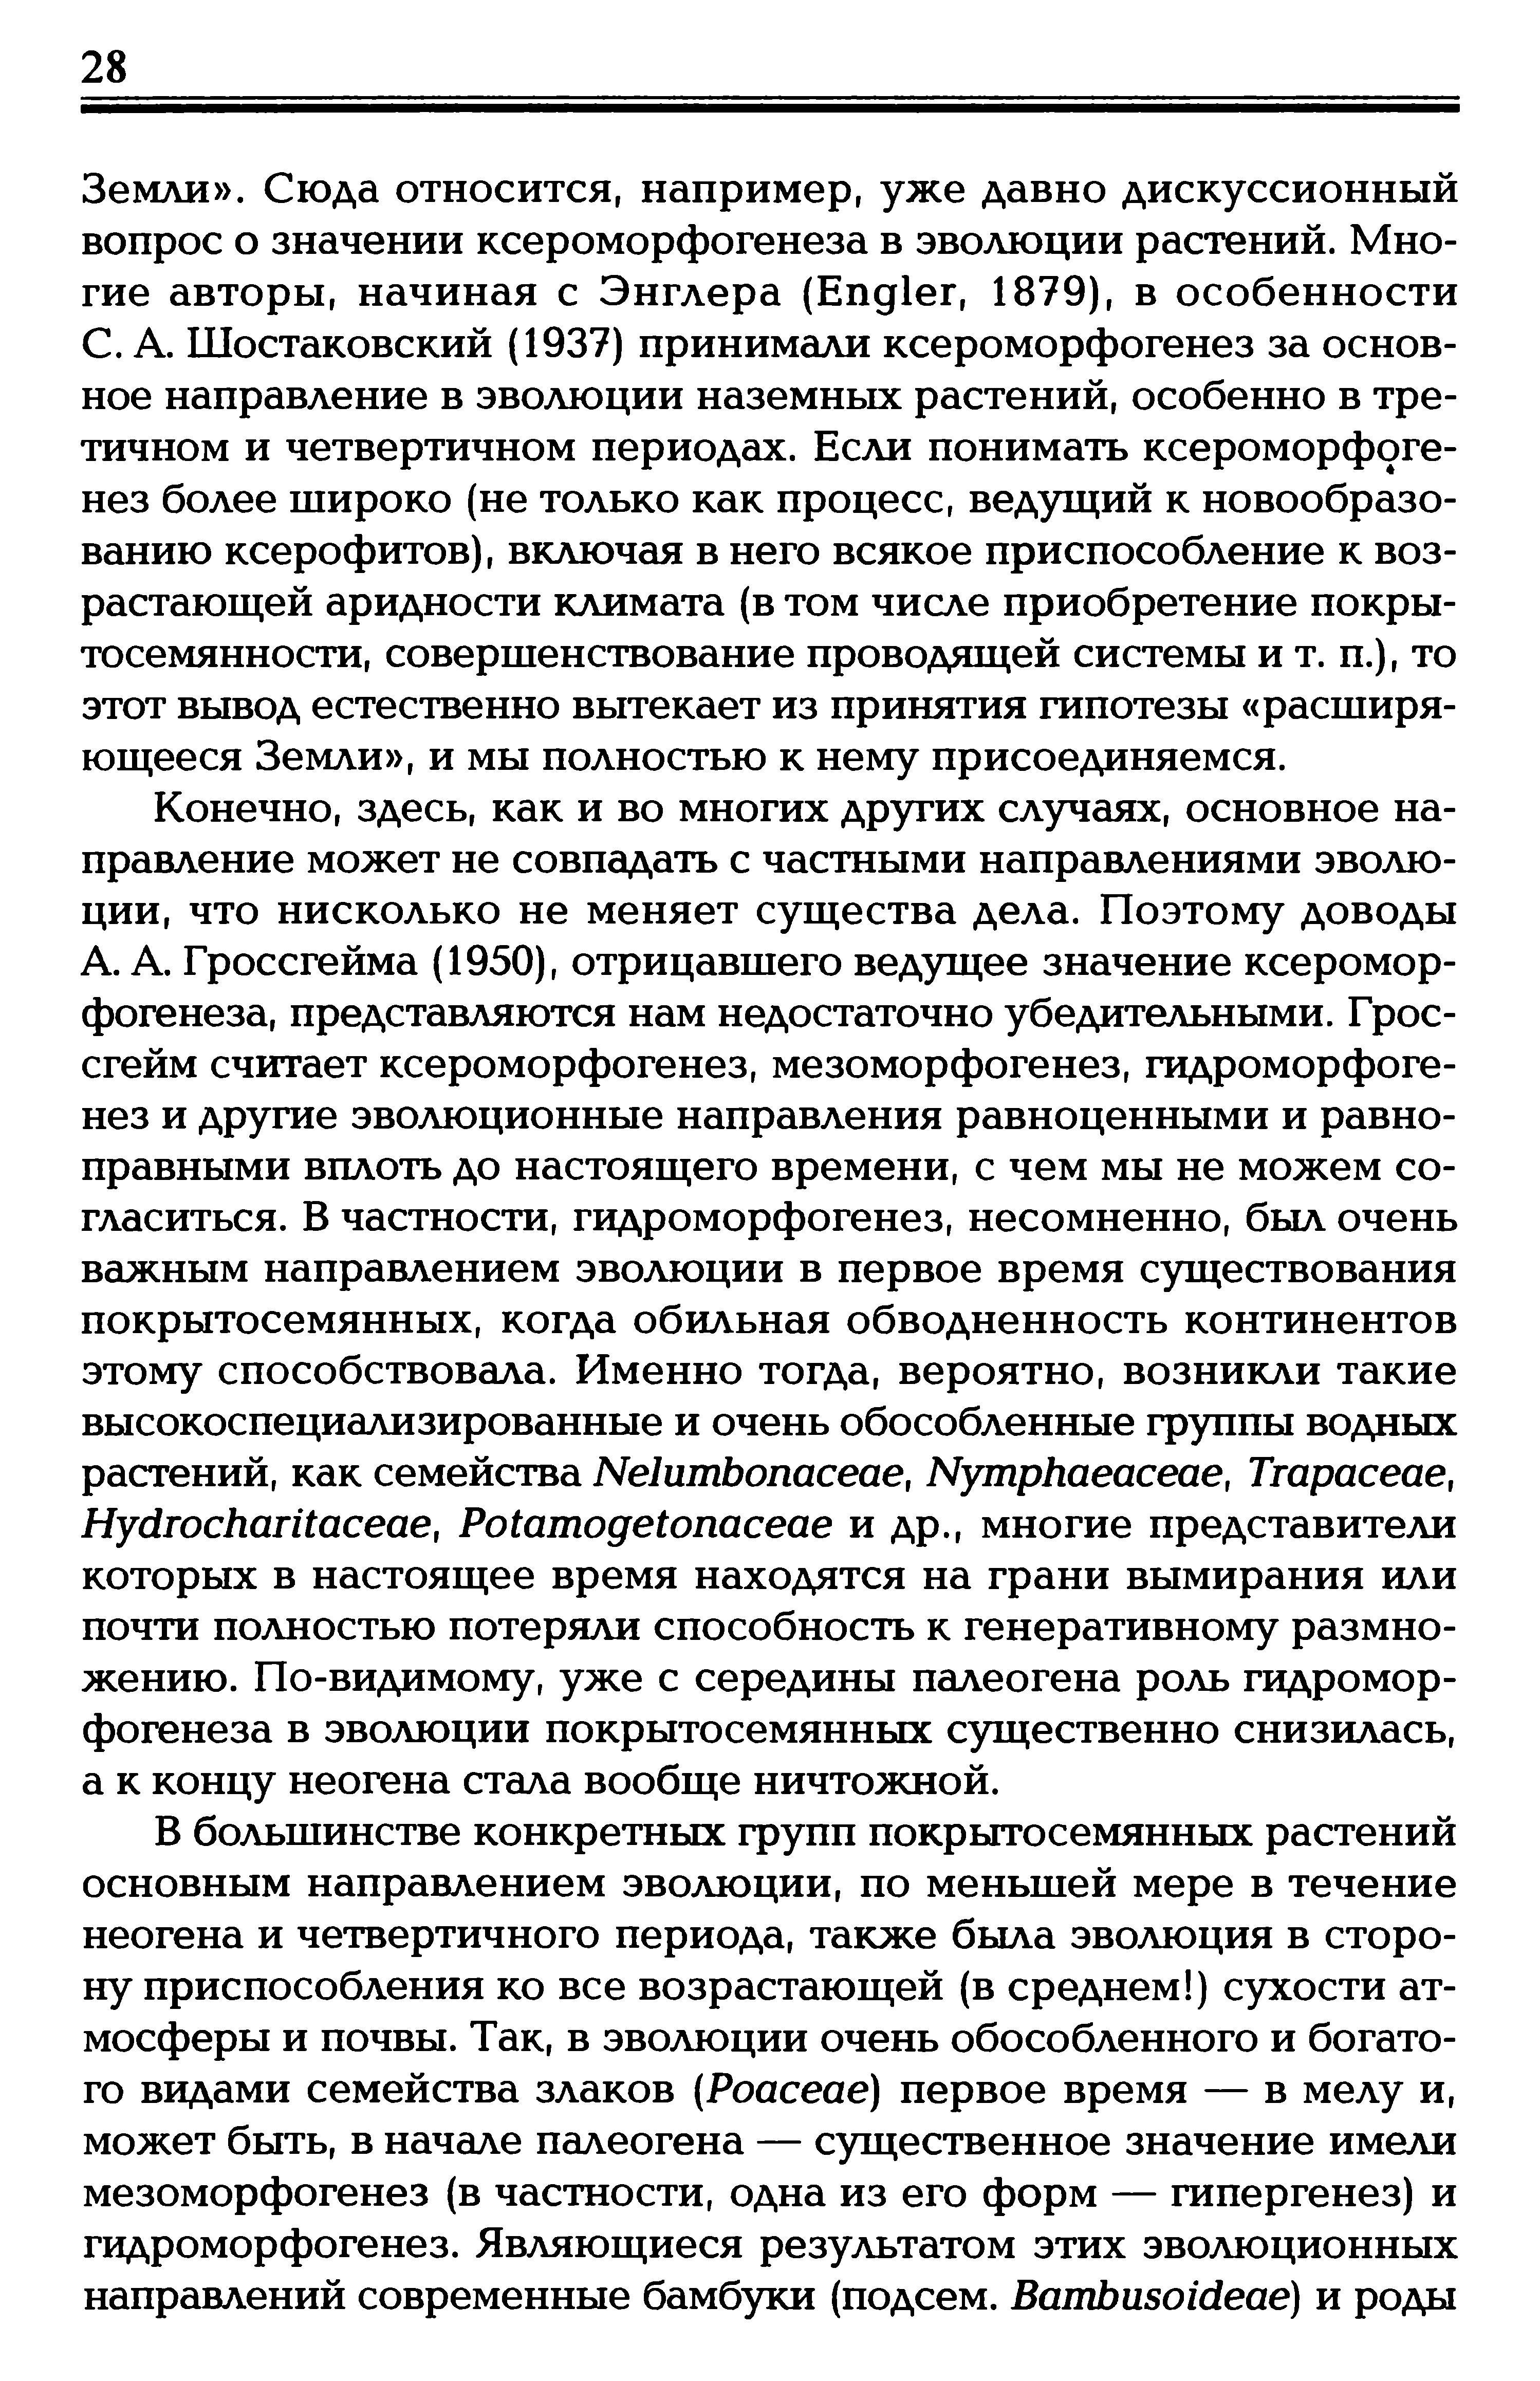 Tzvelev, 2005_1_09.jpeg